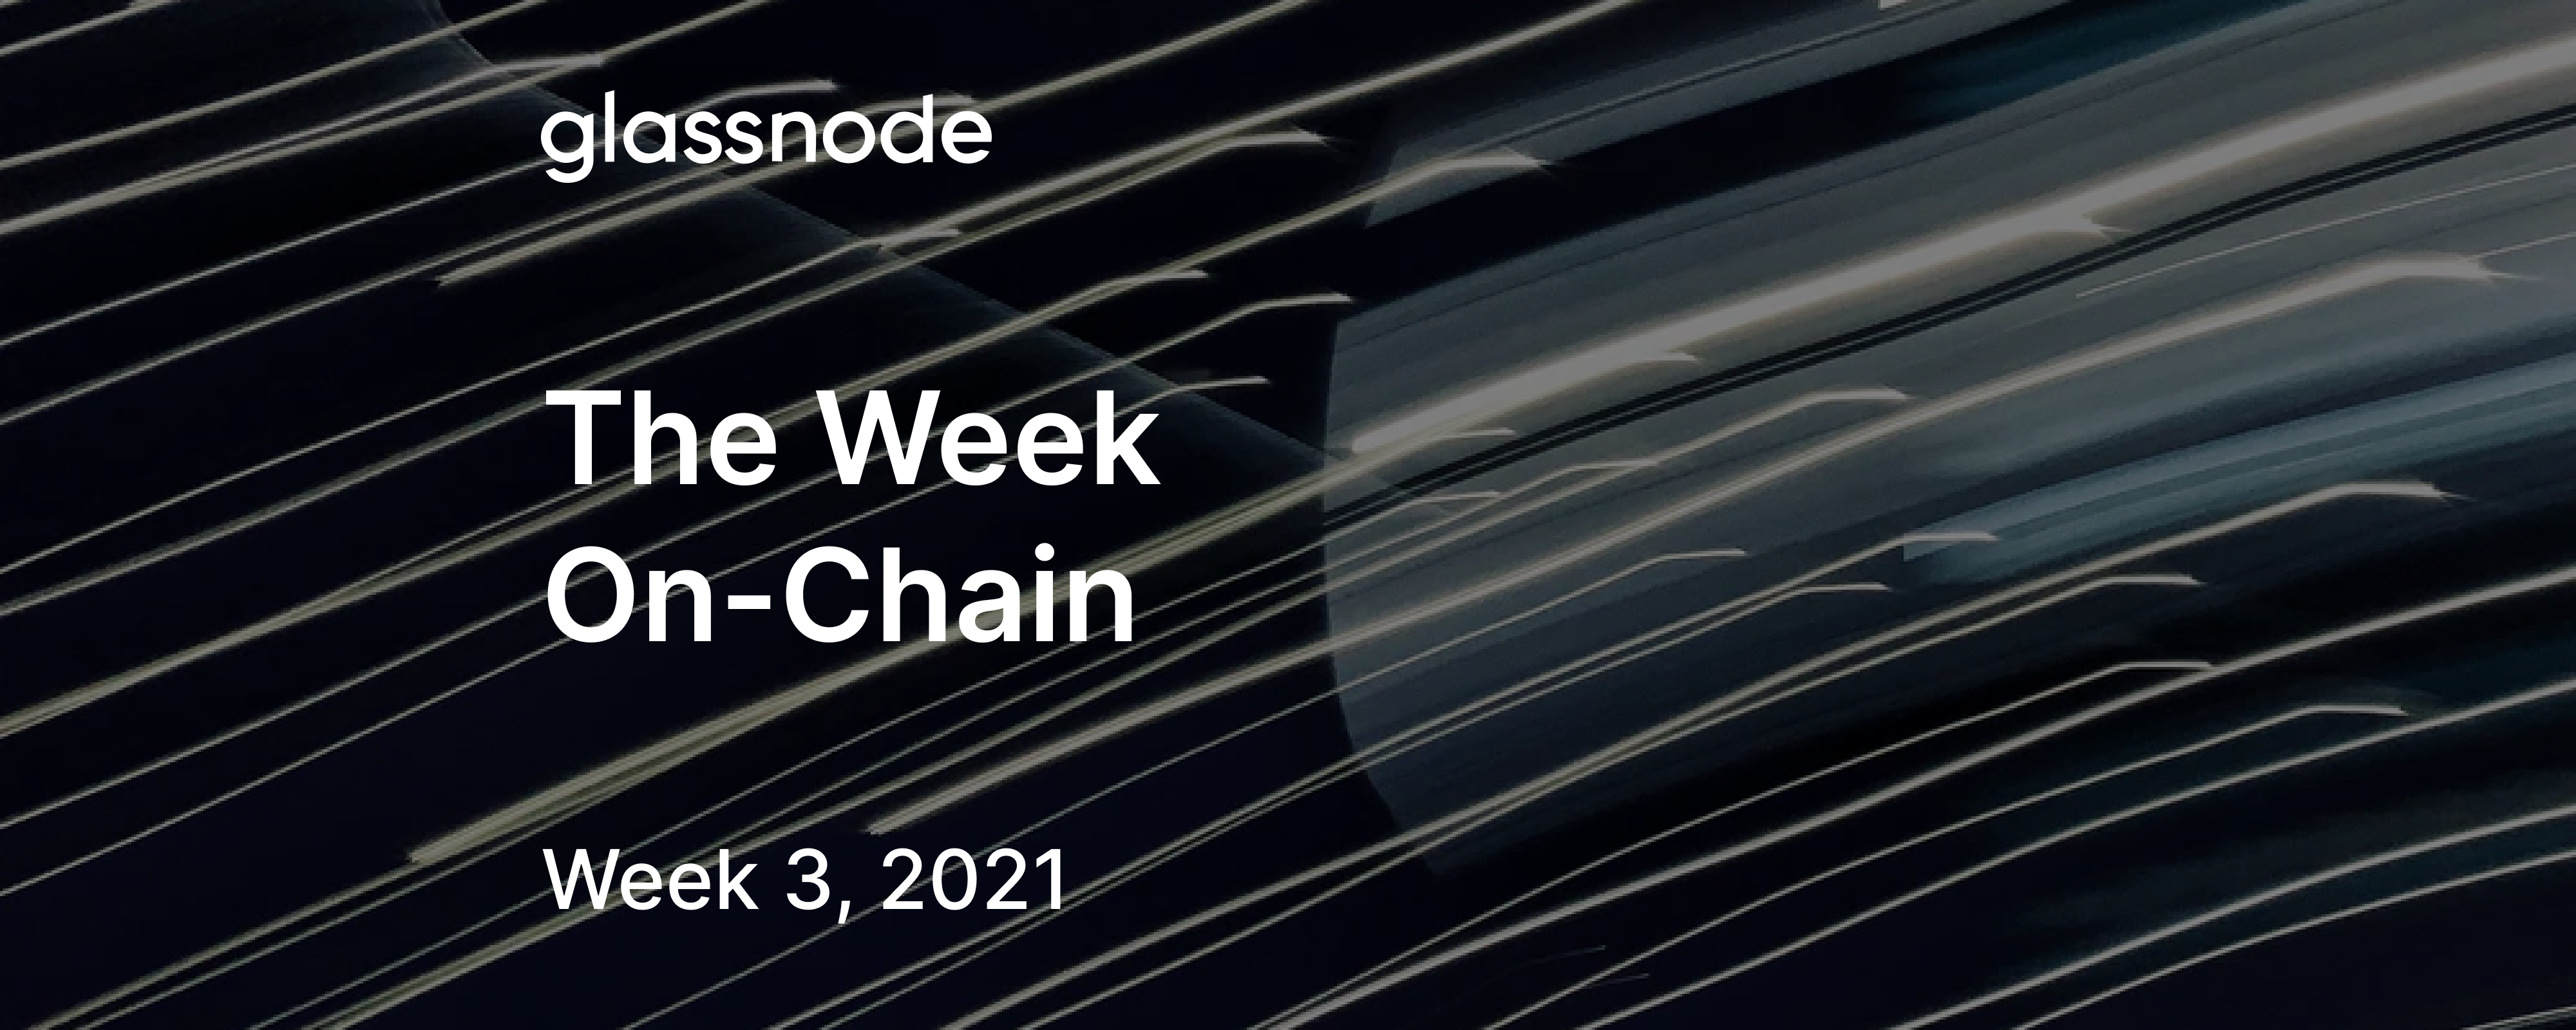 The Week On-Chain (Week 3, 2021)